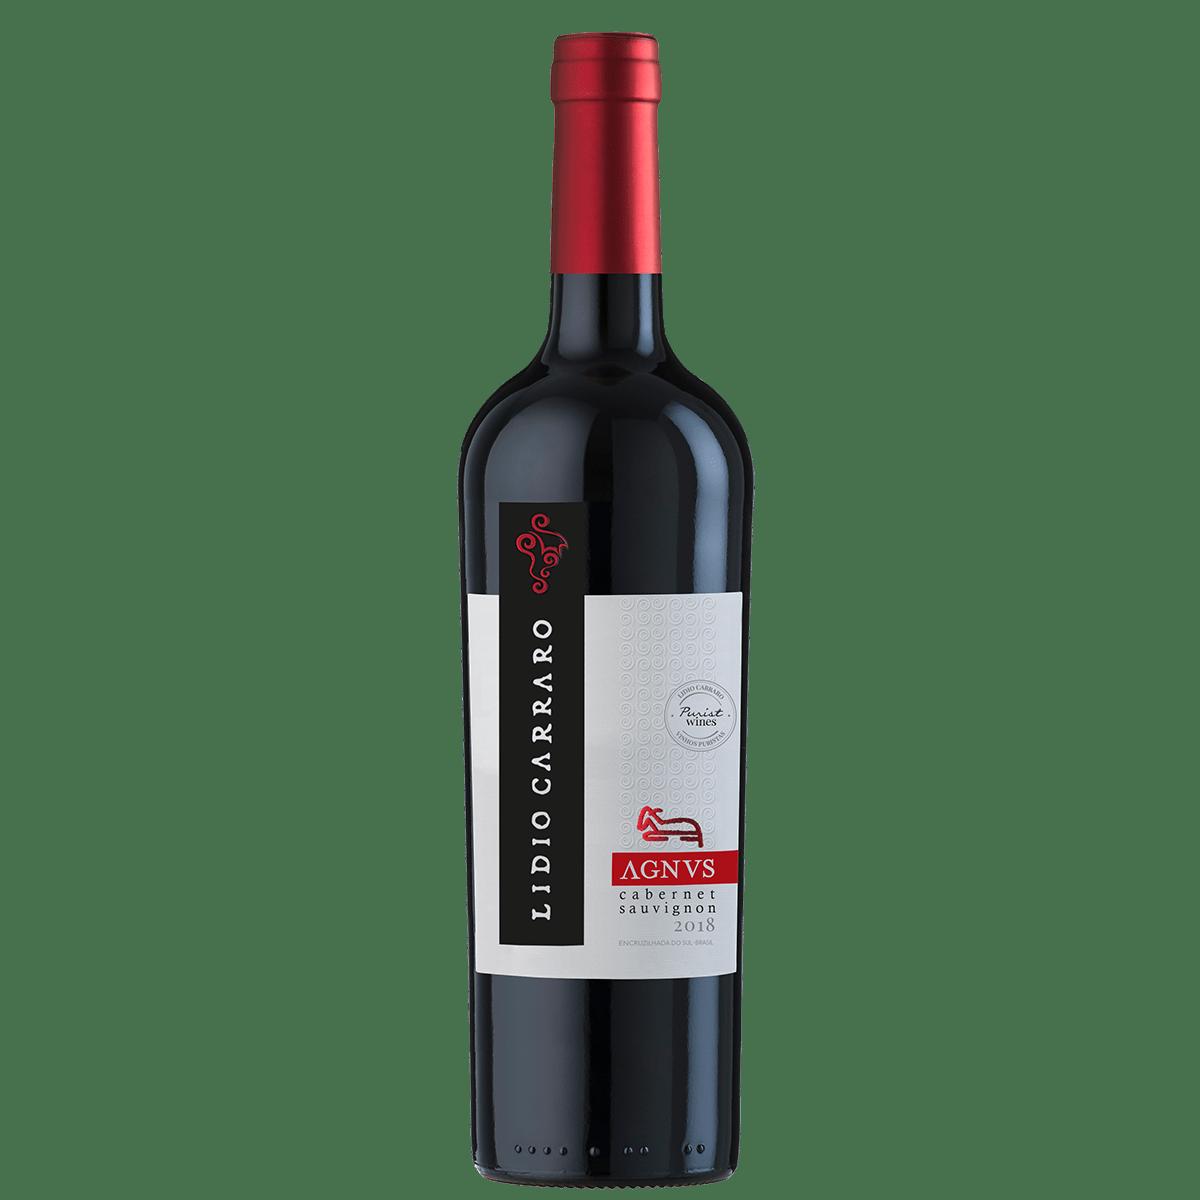 Vinho Lidio Carraro Agnus Cabernet Sauvignon 2018 750ml